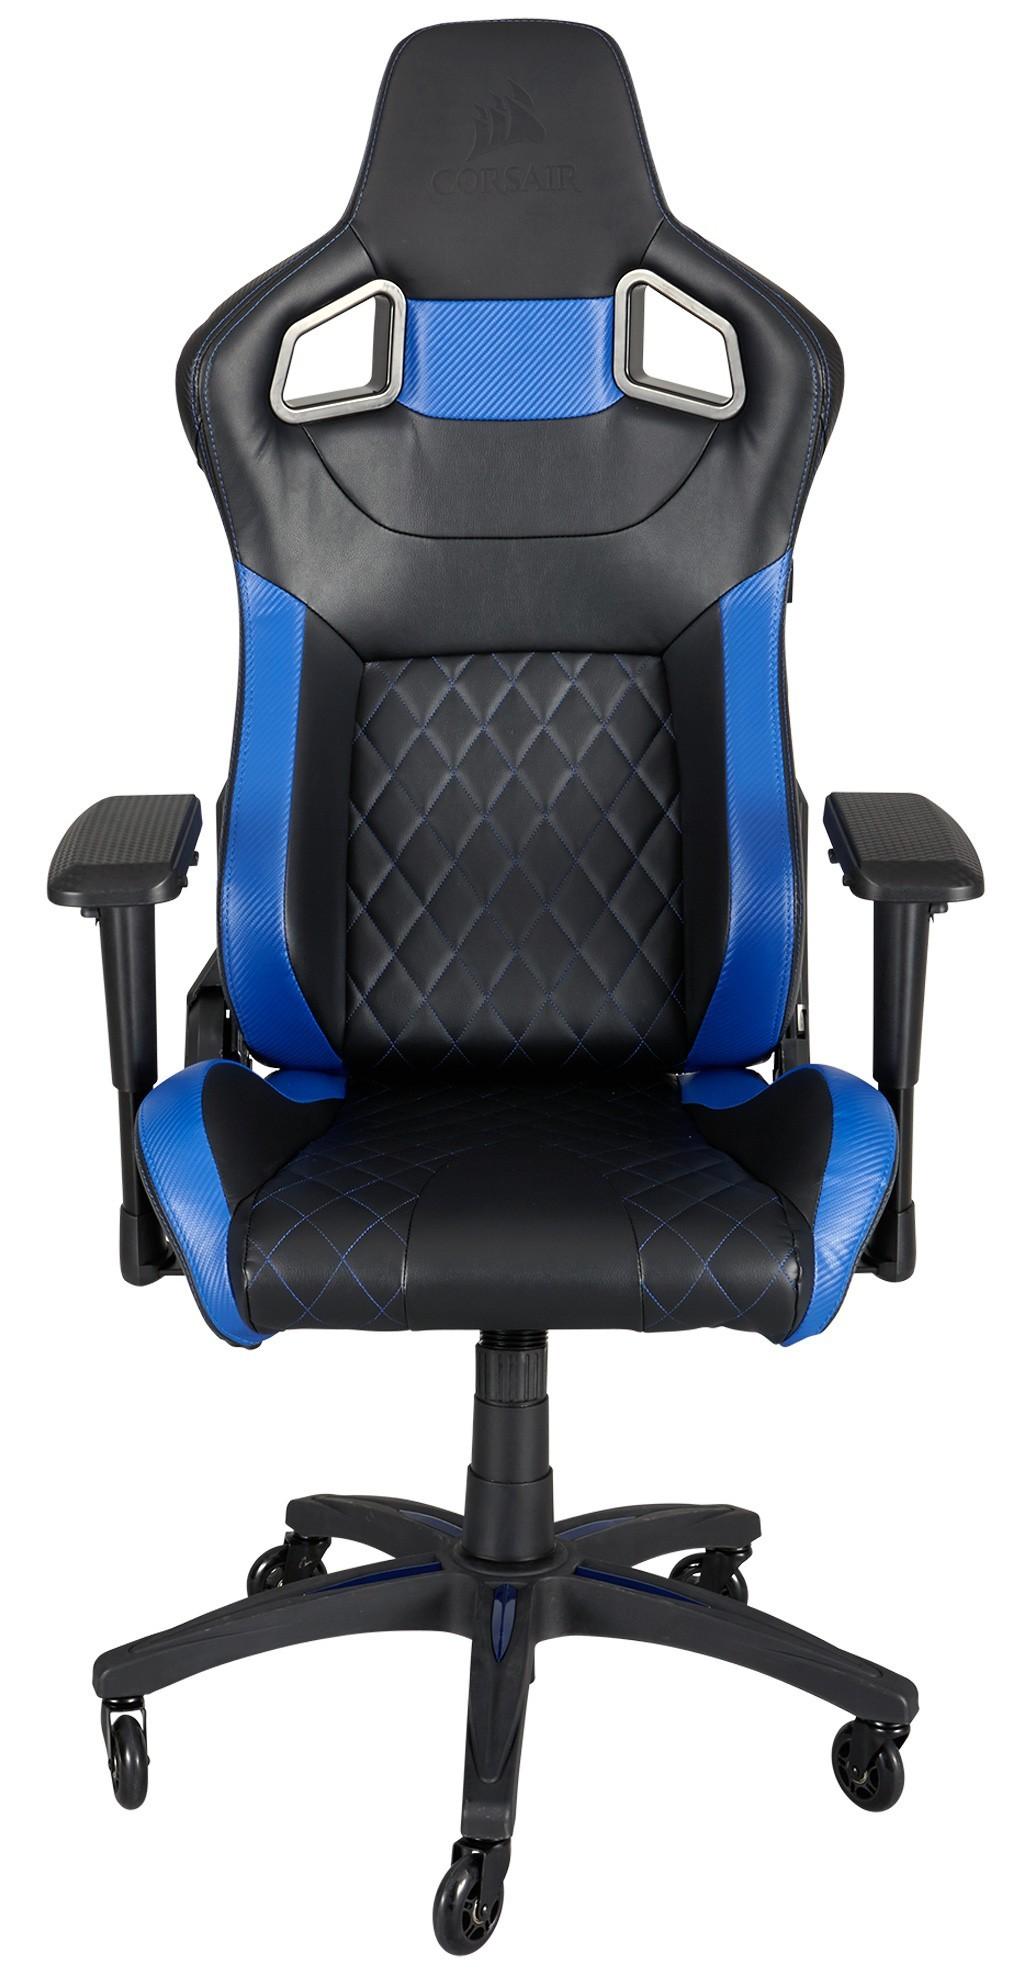 test chaise Corsair T1 Race